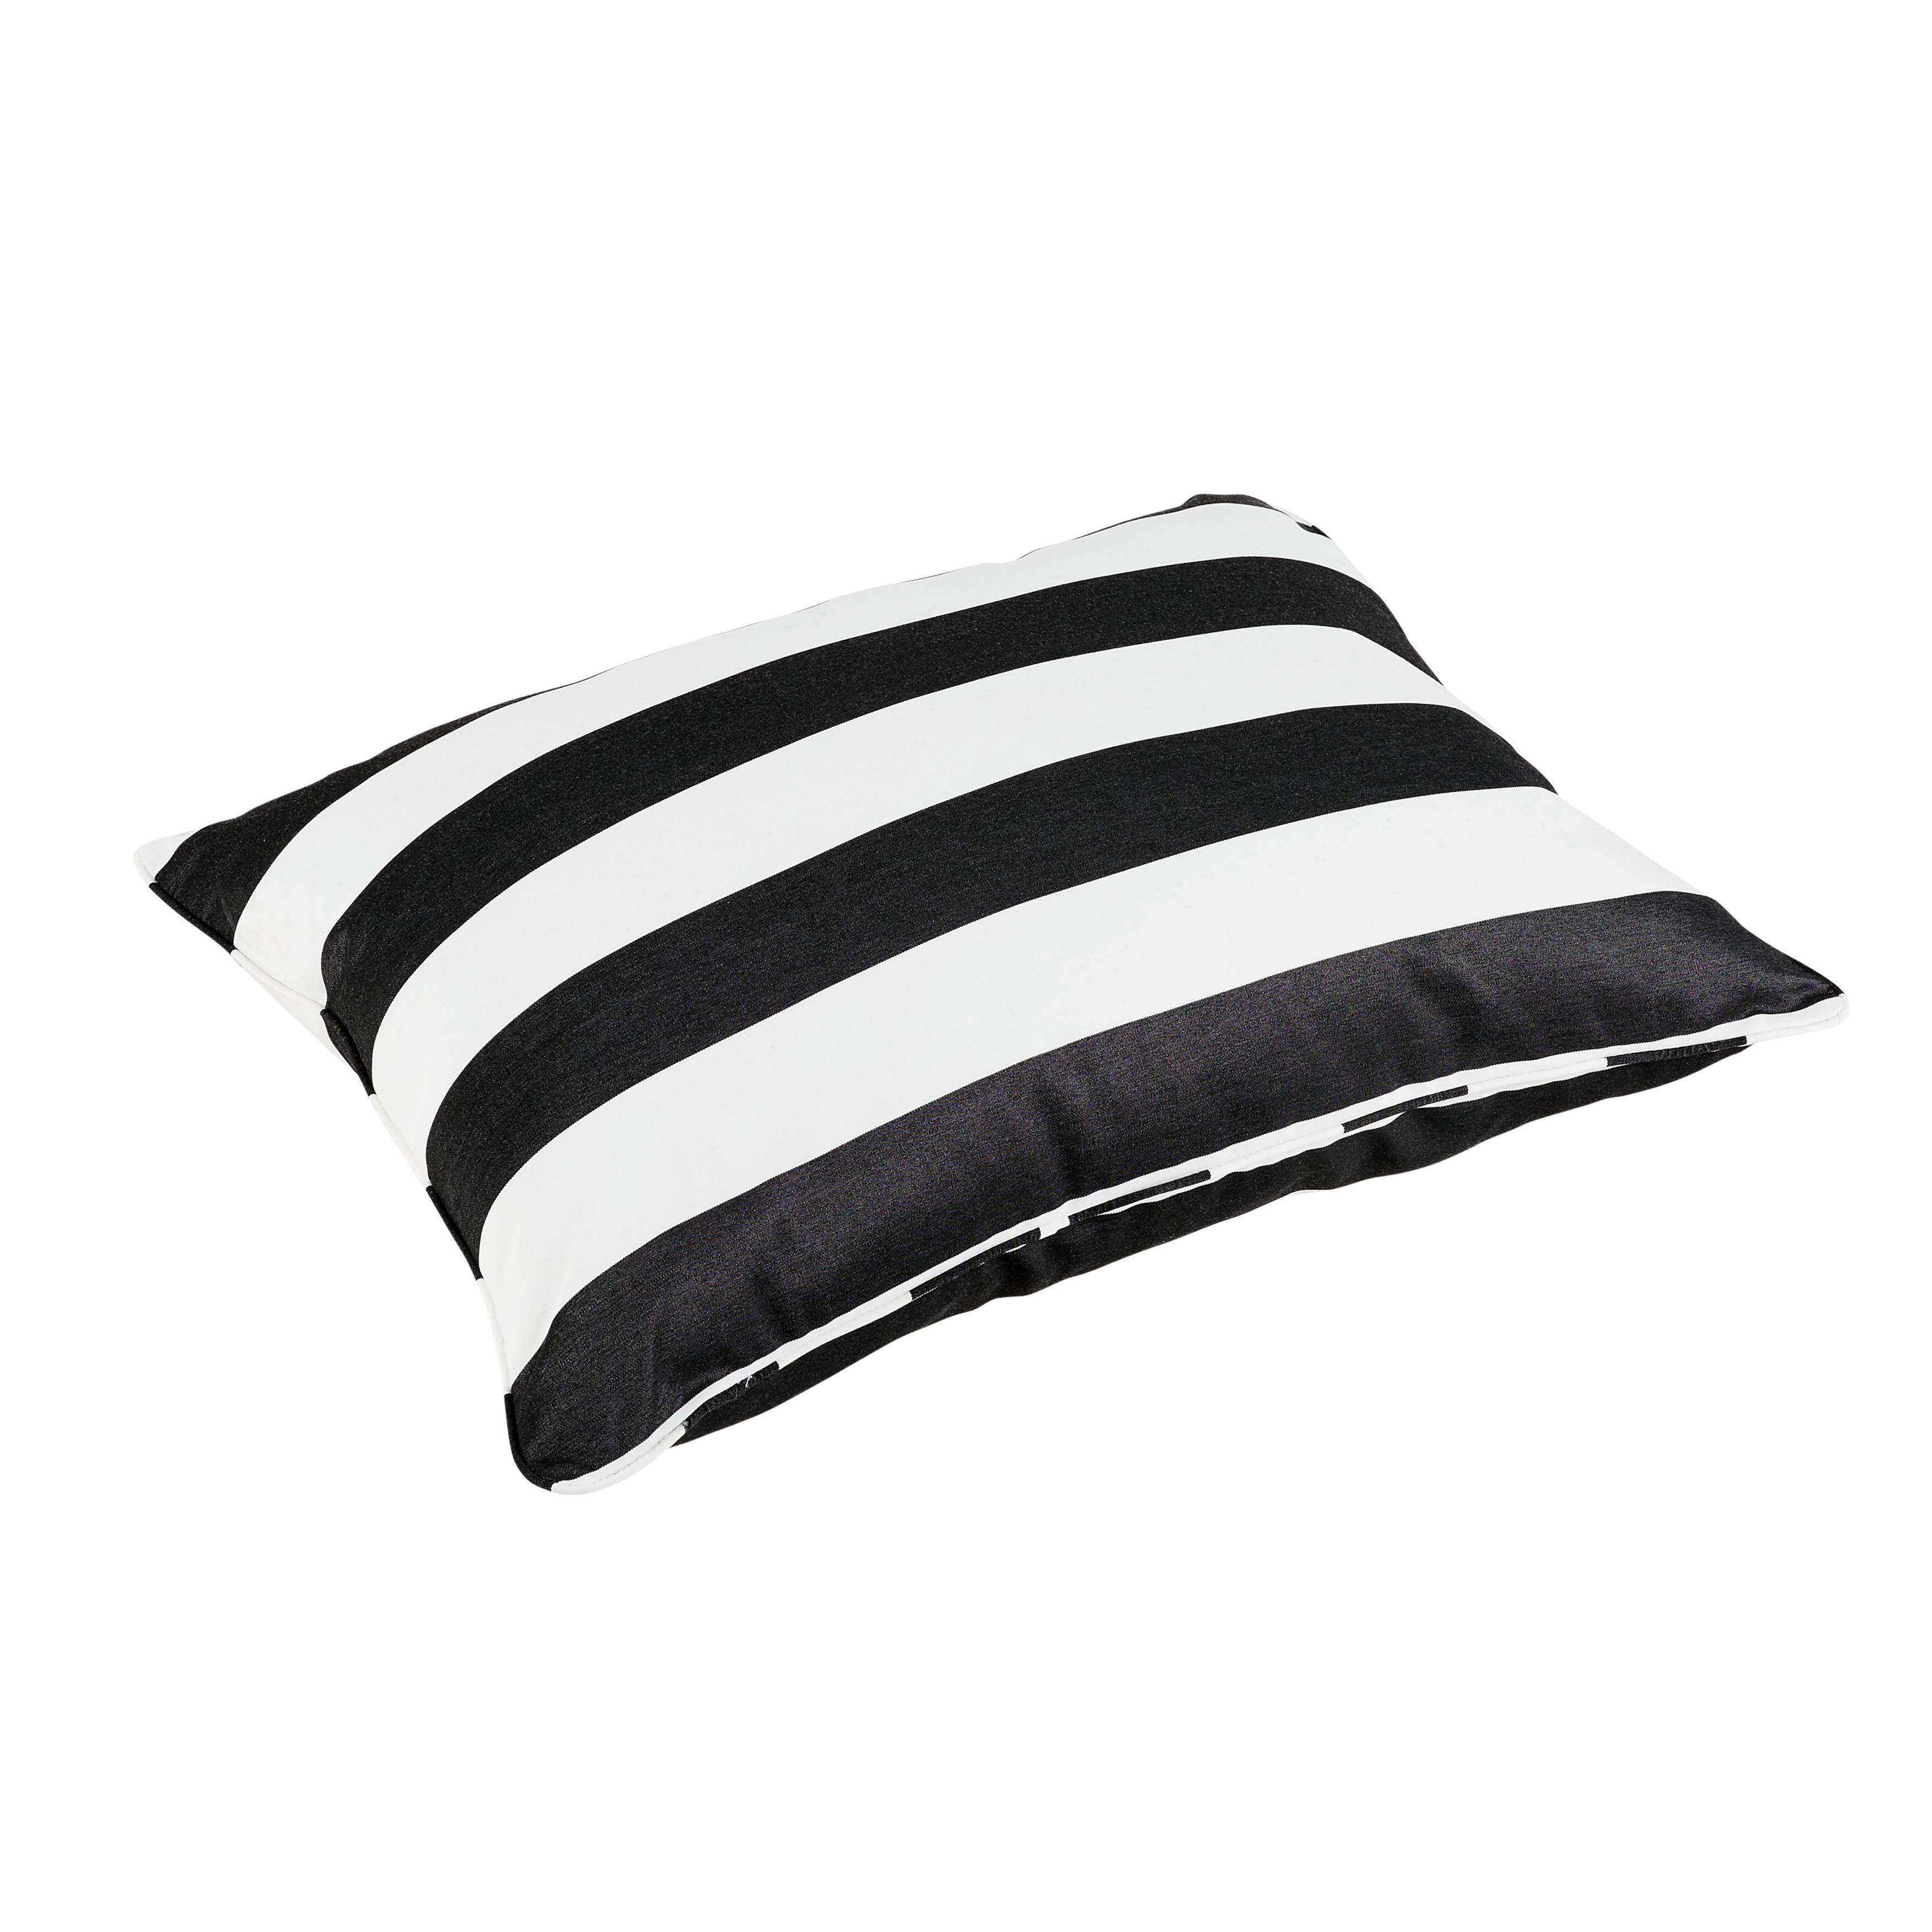 Floor Striped Throw Pillows You Ll Love In 2021 Wayfair